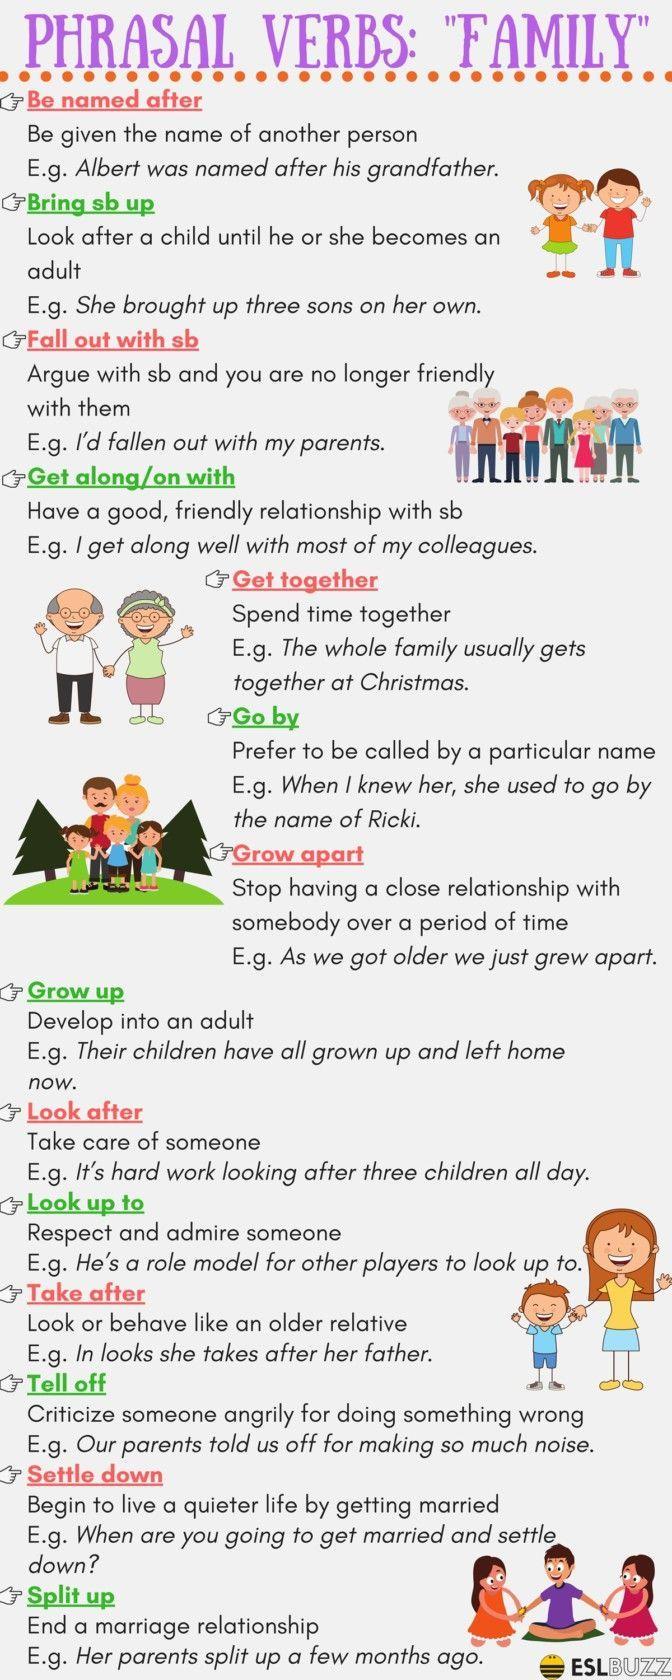 English Phrasal Verbs for Communication – Fluent Land